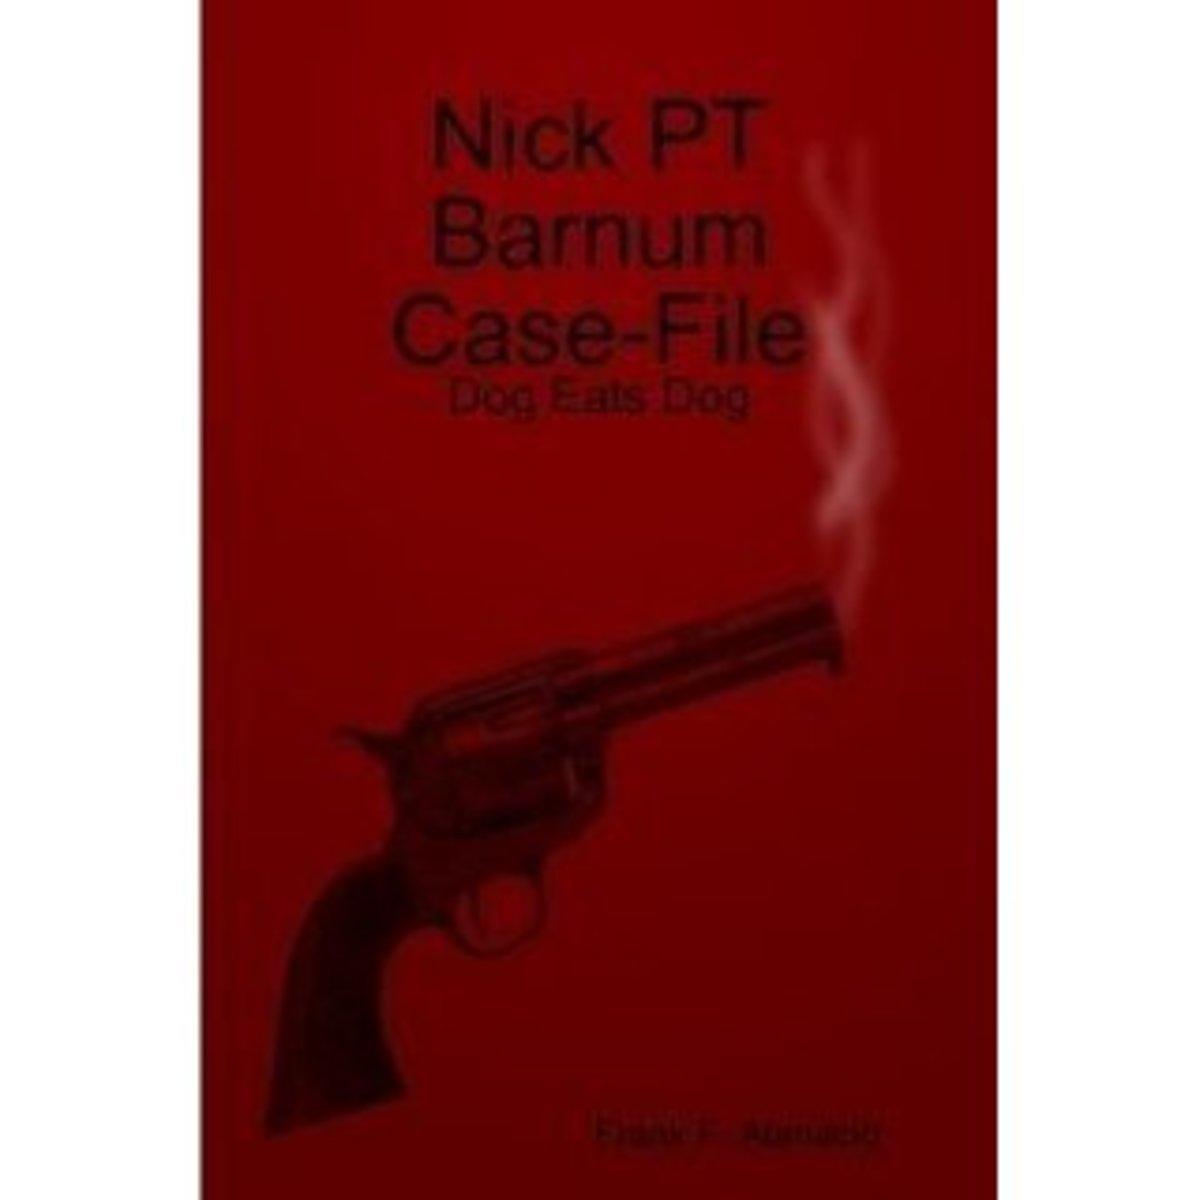 Nick PT Barnum's Dog Eats Dog